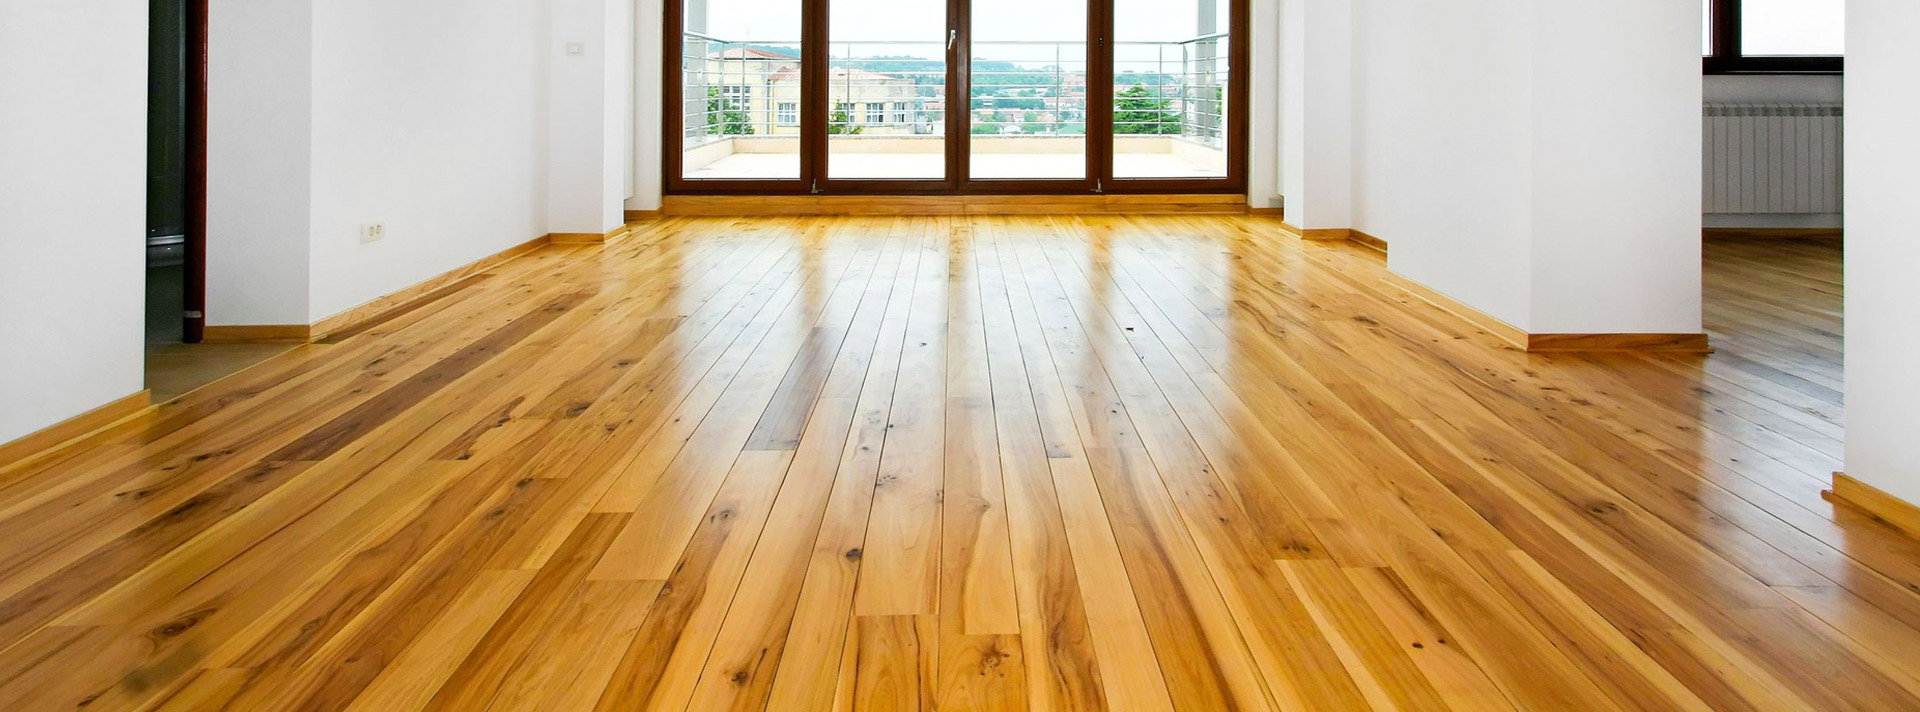 Floor Sanding & Polishing Specialist in Melbourne - MAB Timber Floors